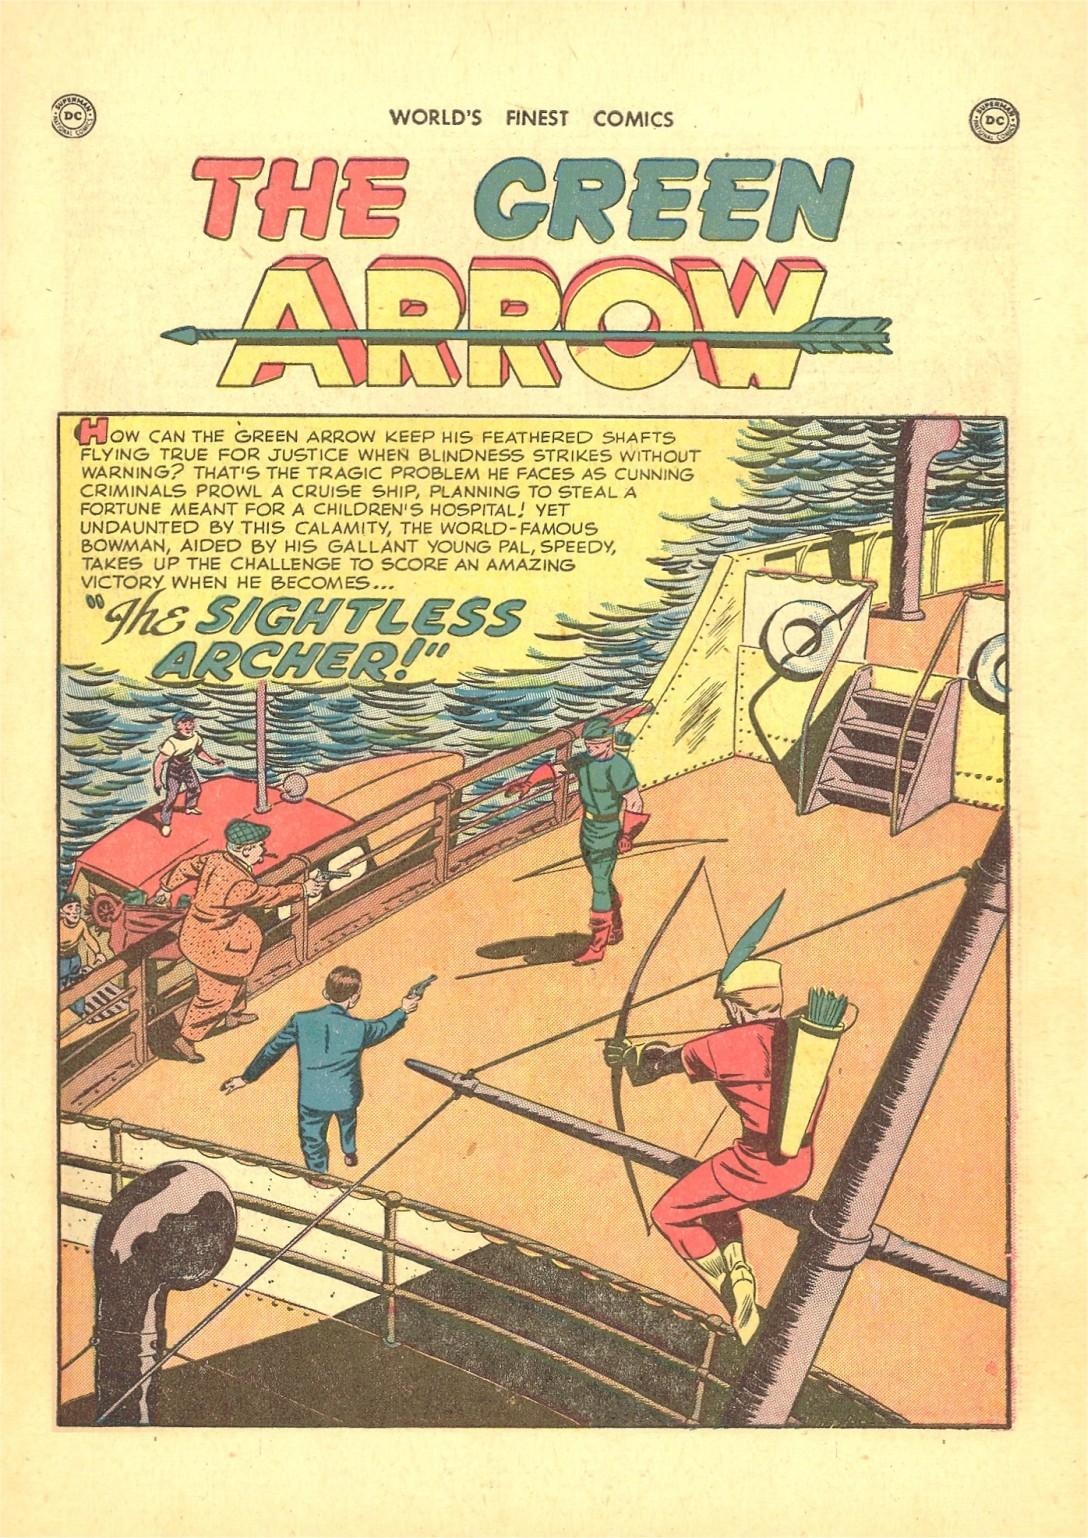 Read online World's Finest Comics comic -  Issue #50 - 17